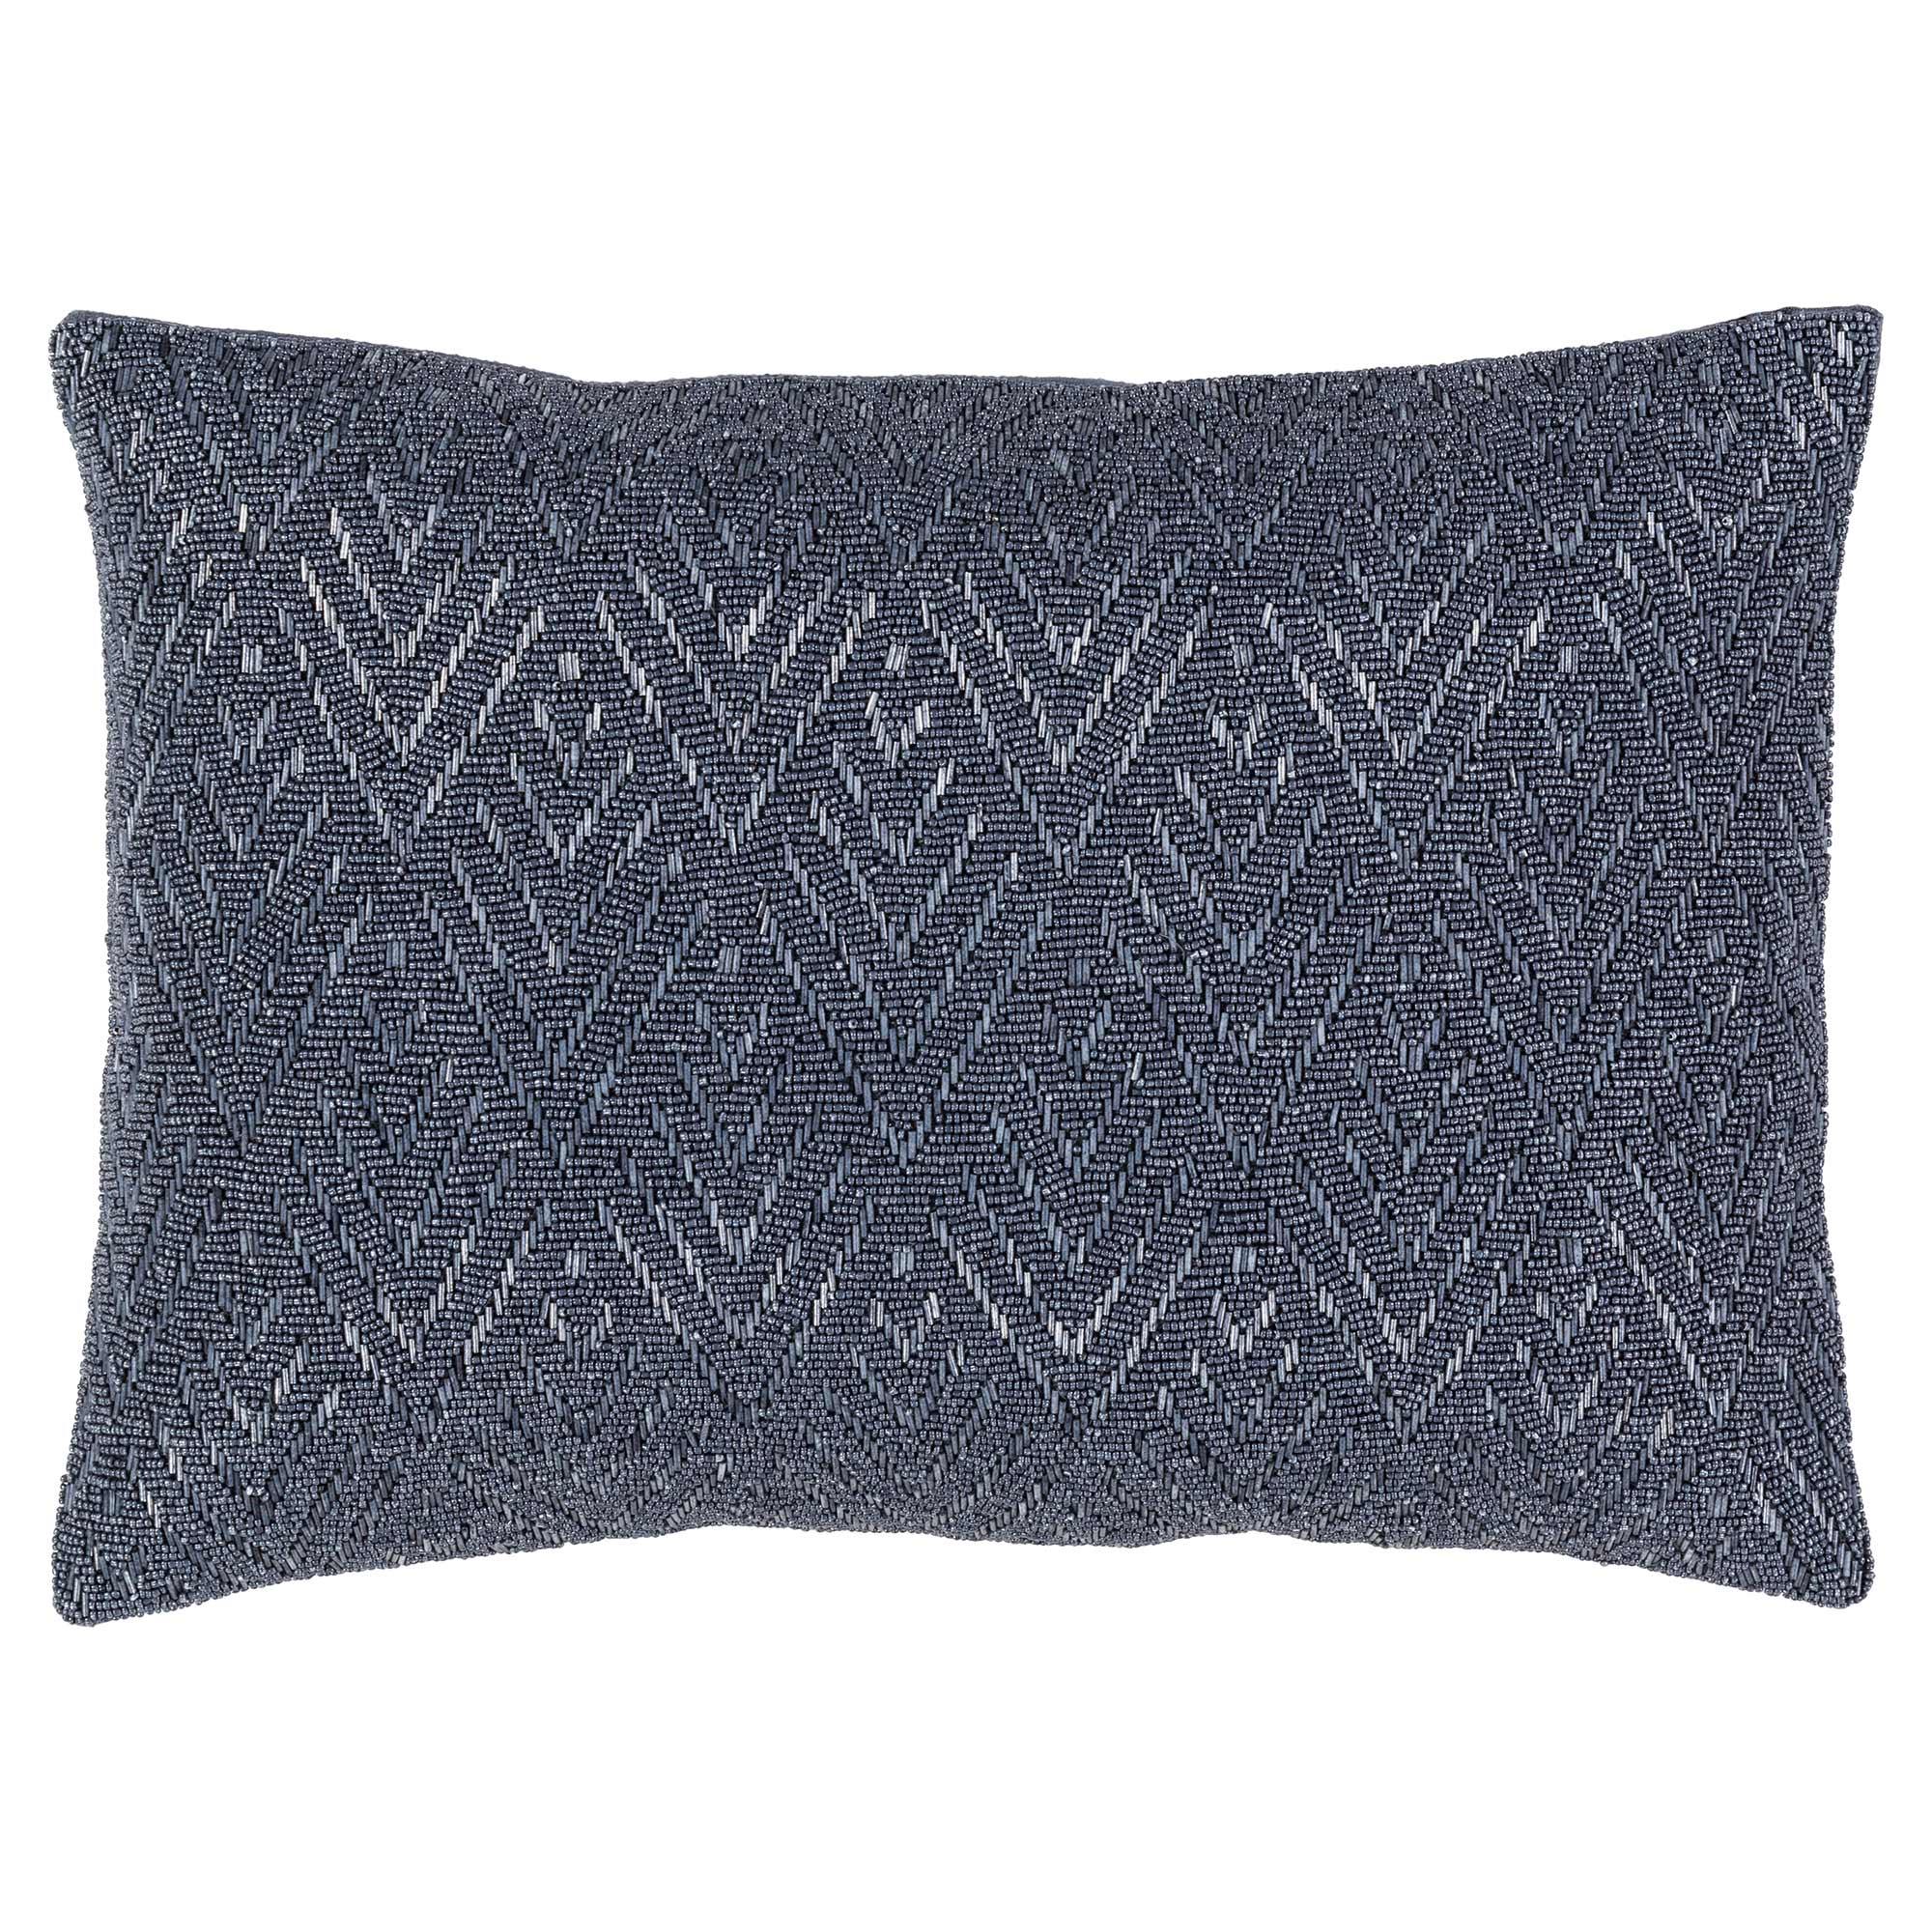 Lusins Global Regency Woven Grey Pillow - 13x19